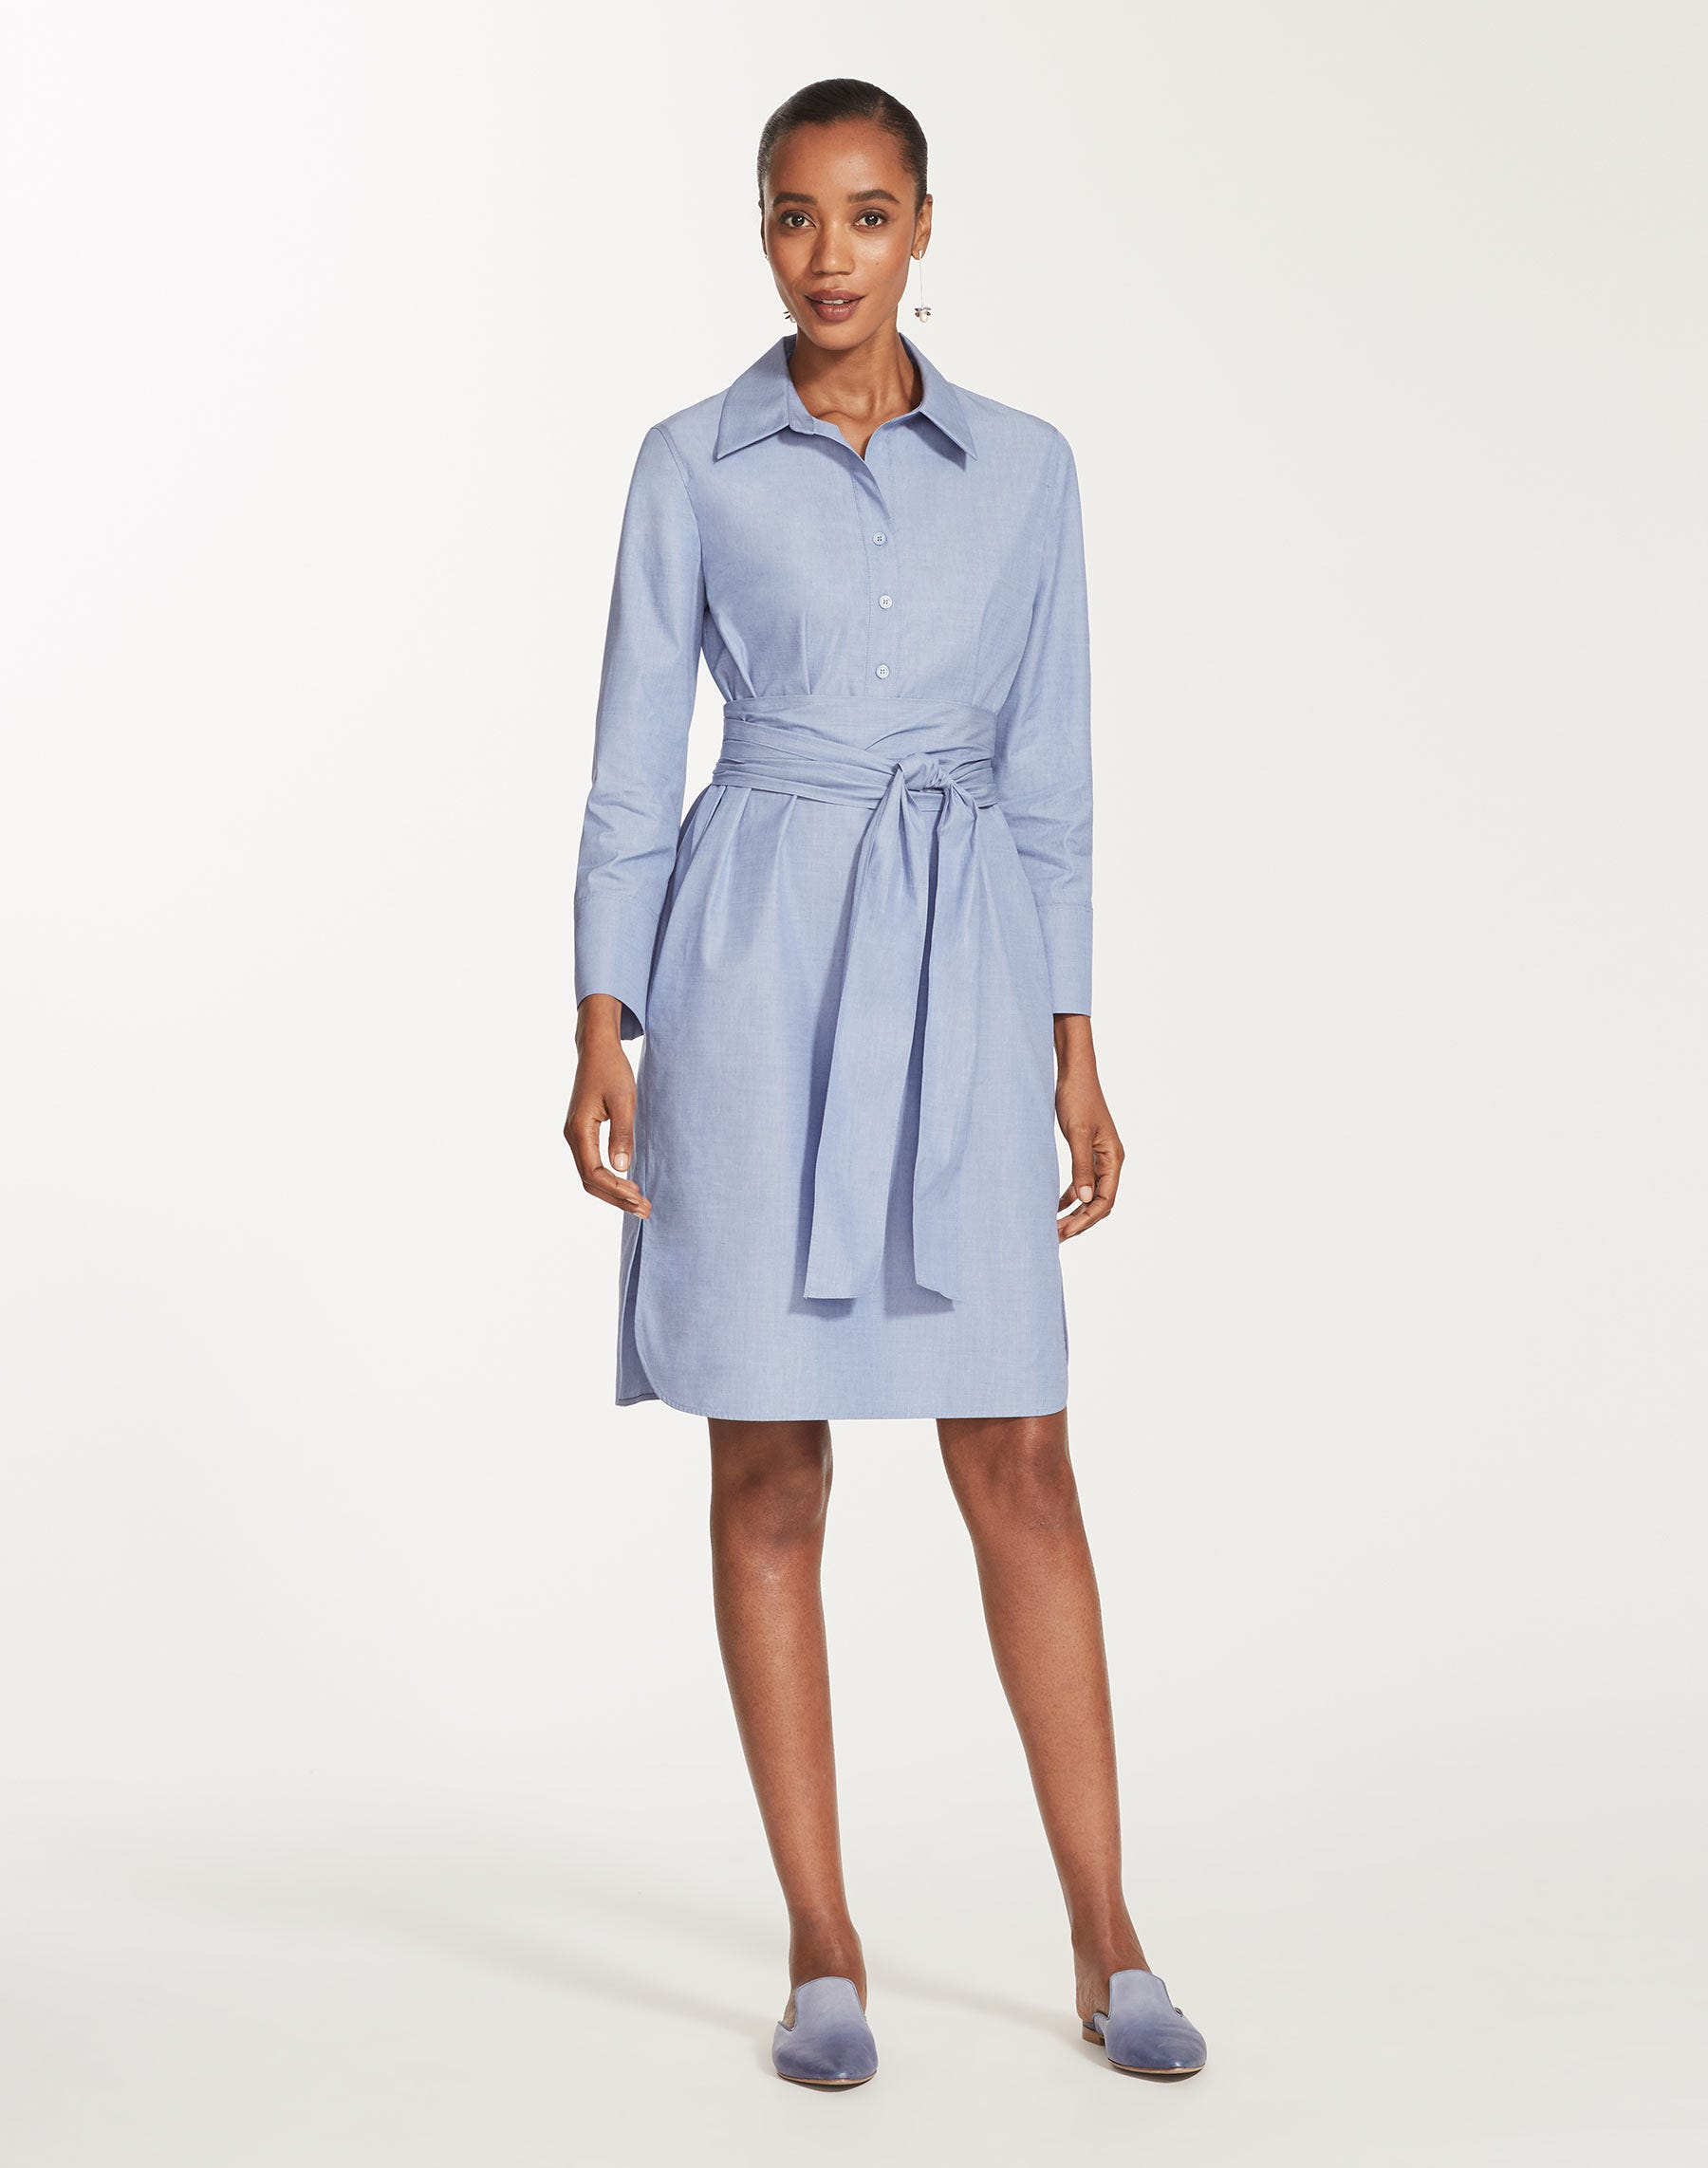 Plus-Size Anthology Shirting Fabiola Dress   Lafayette 148 New York